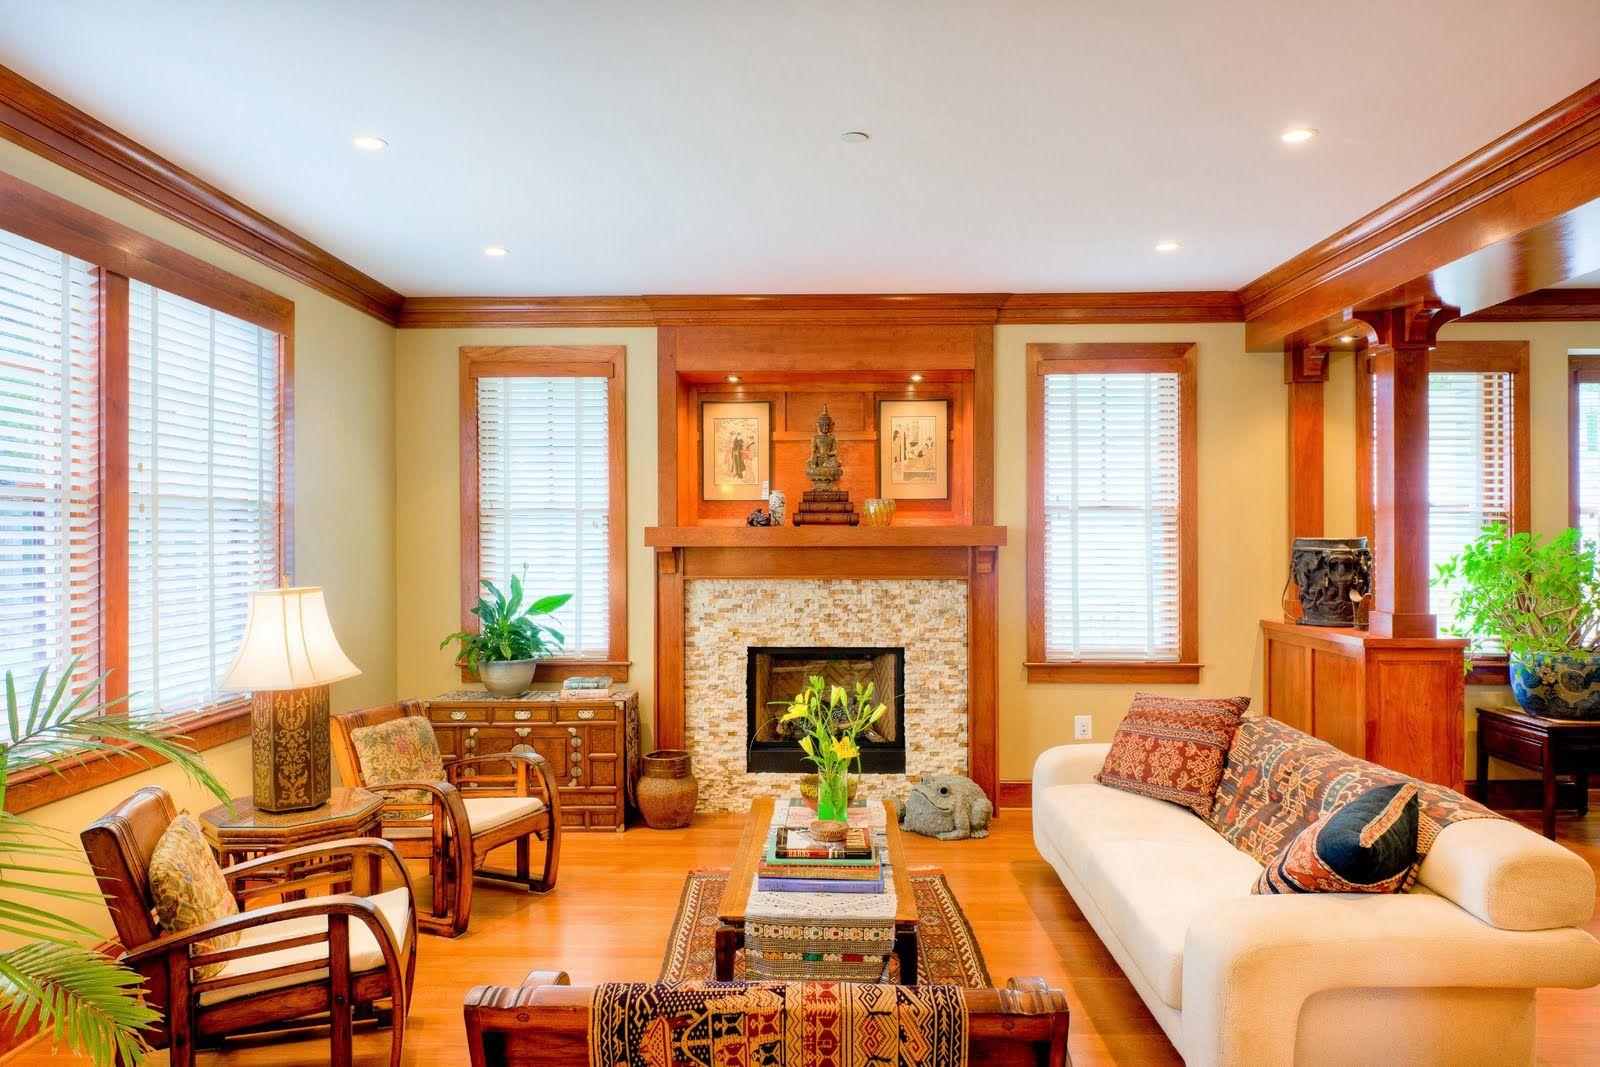 Living Room with Light Oak Trim, Flooring Including ...